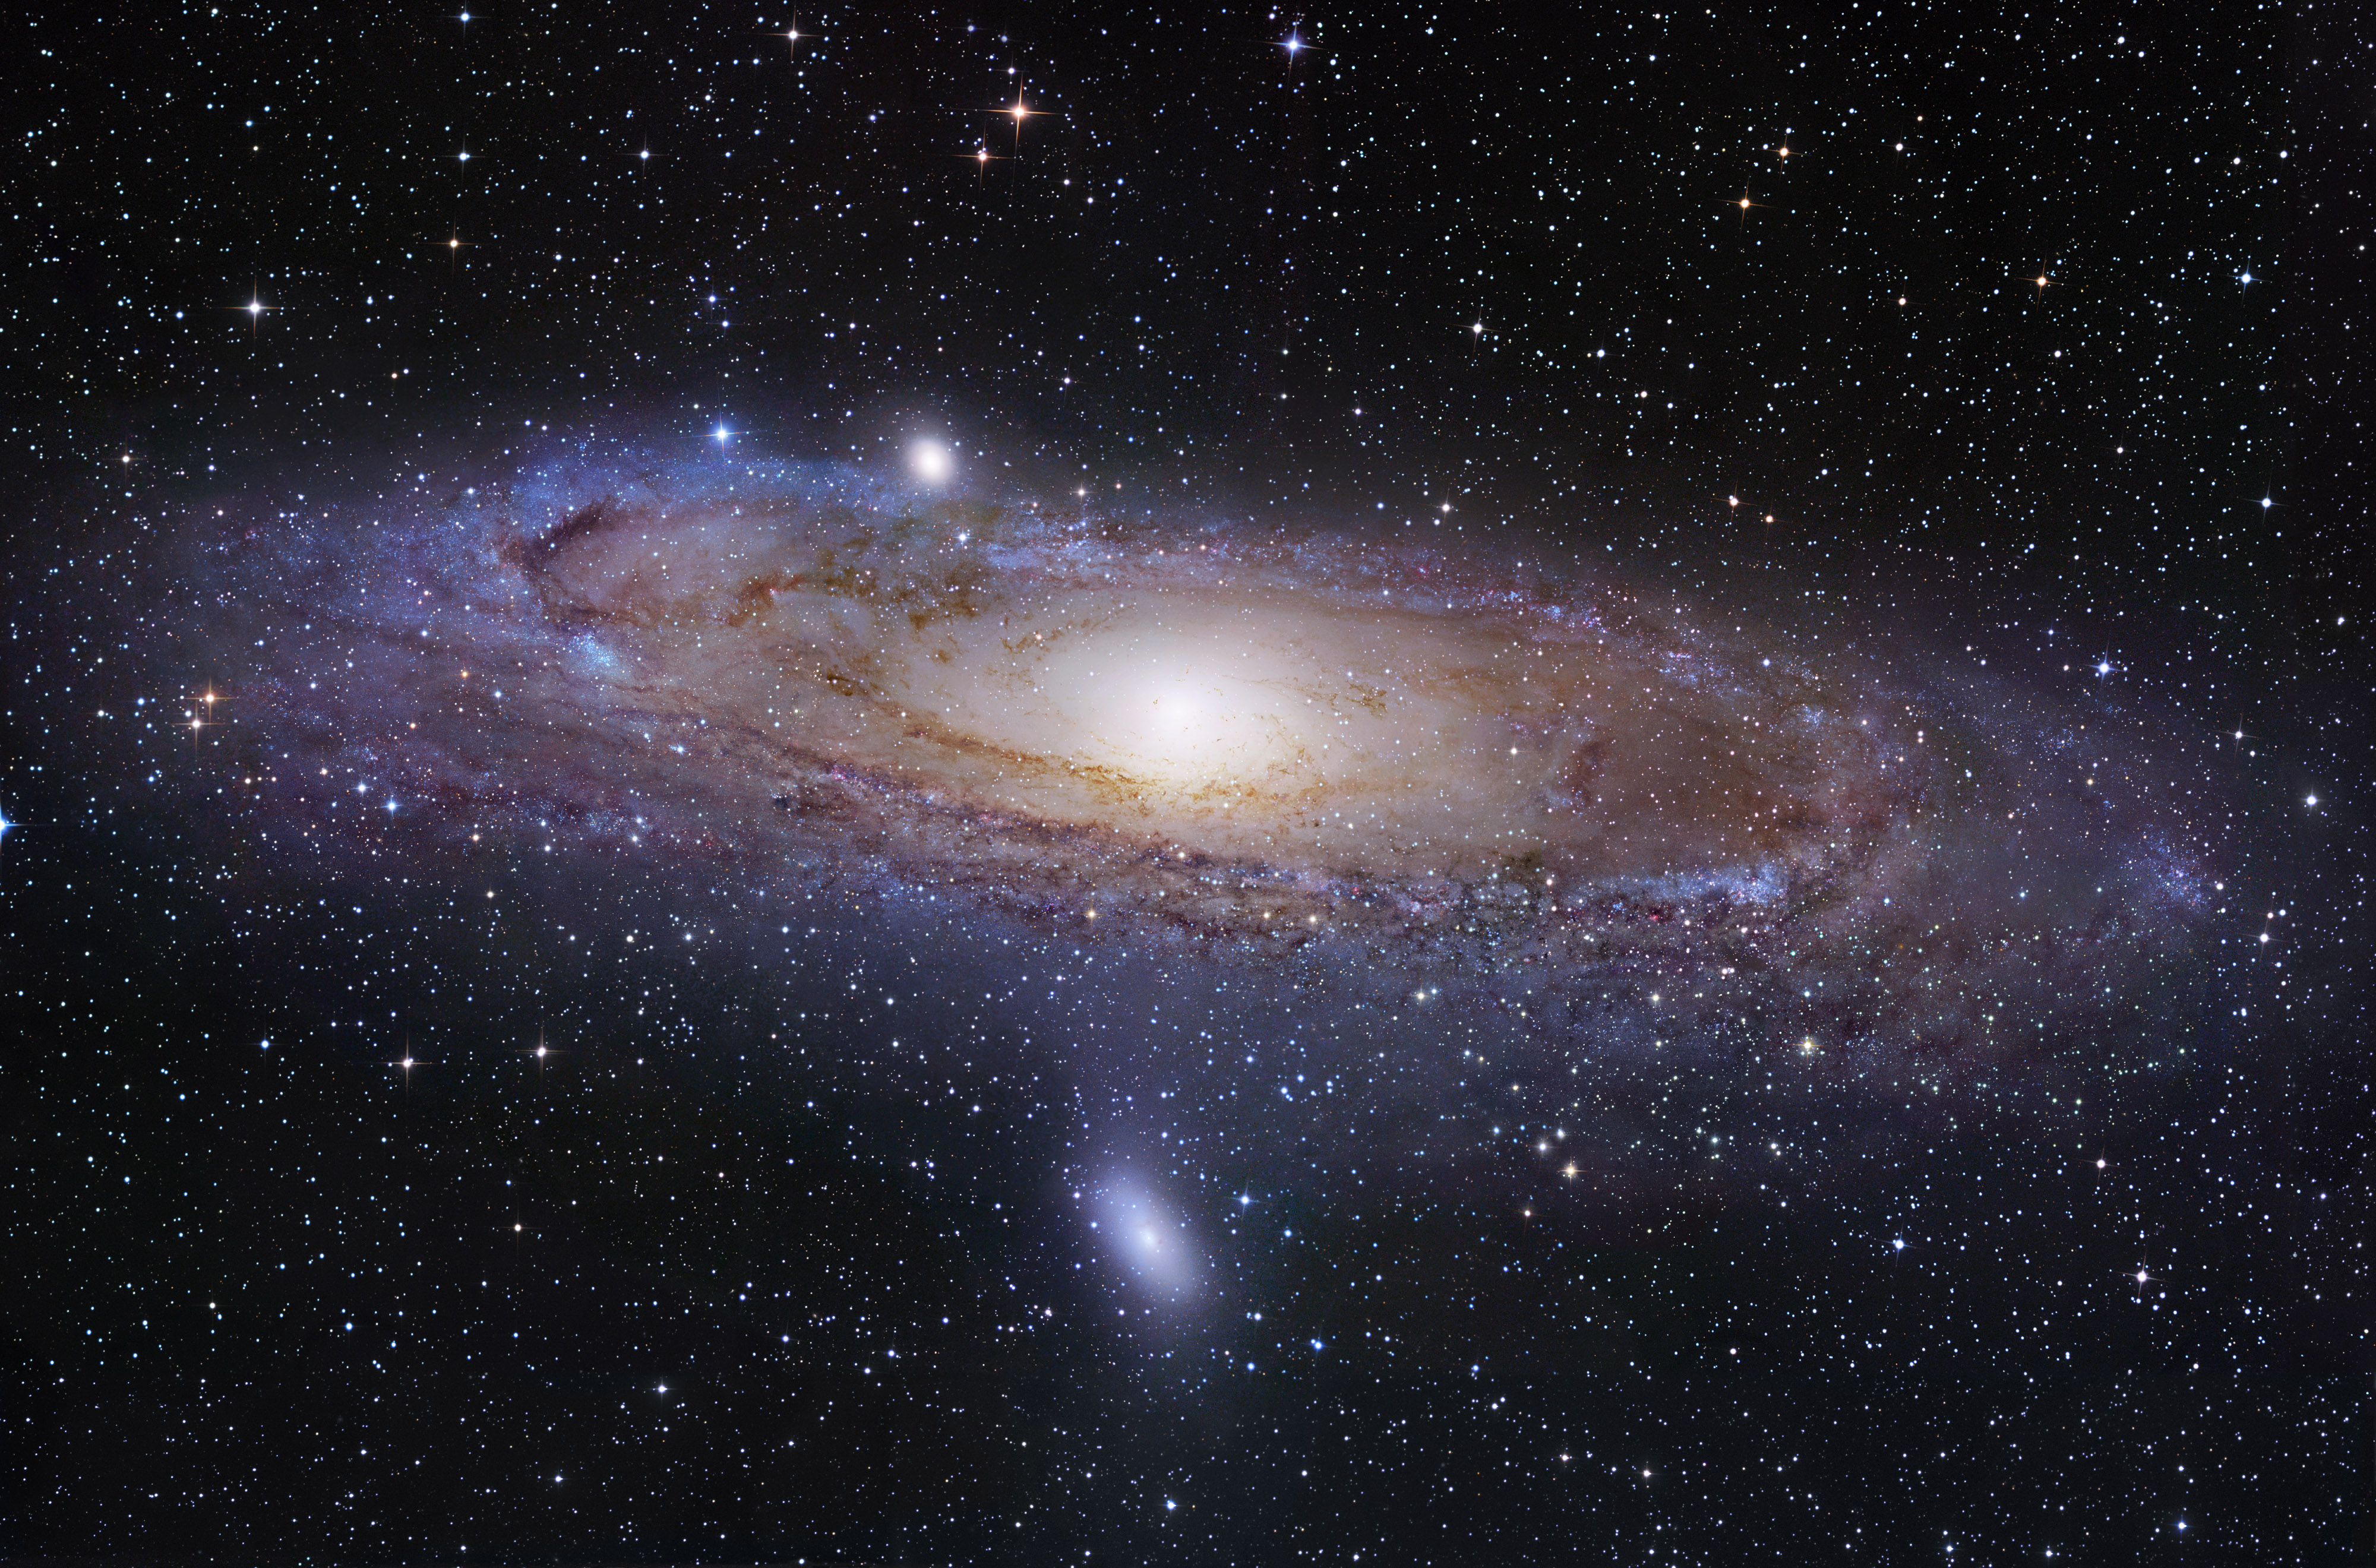 milky way galaxy cluster - photo #18